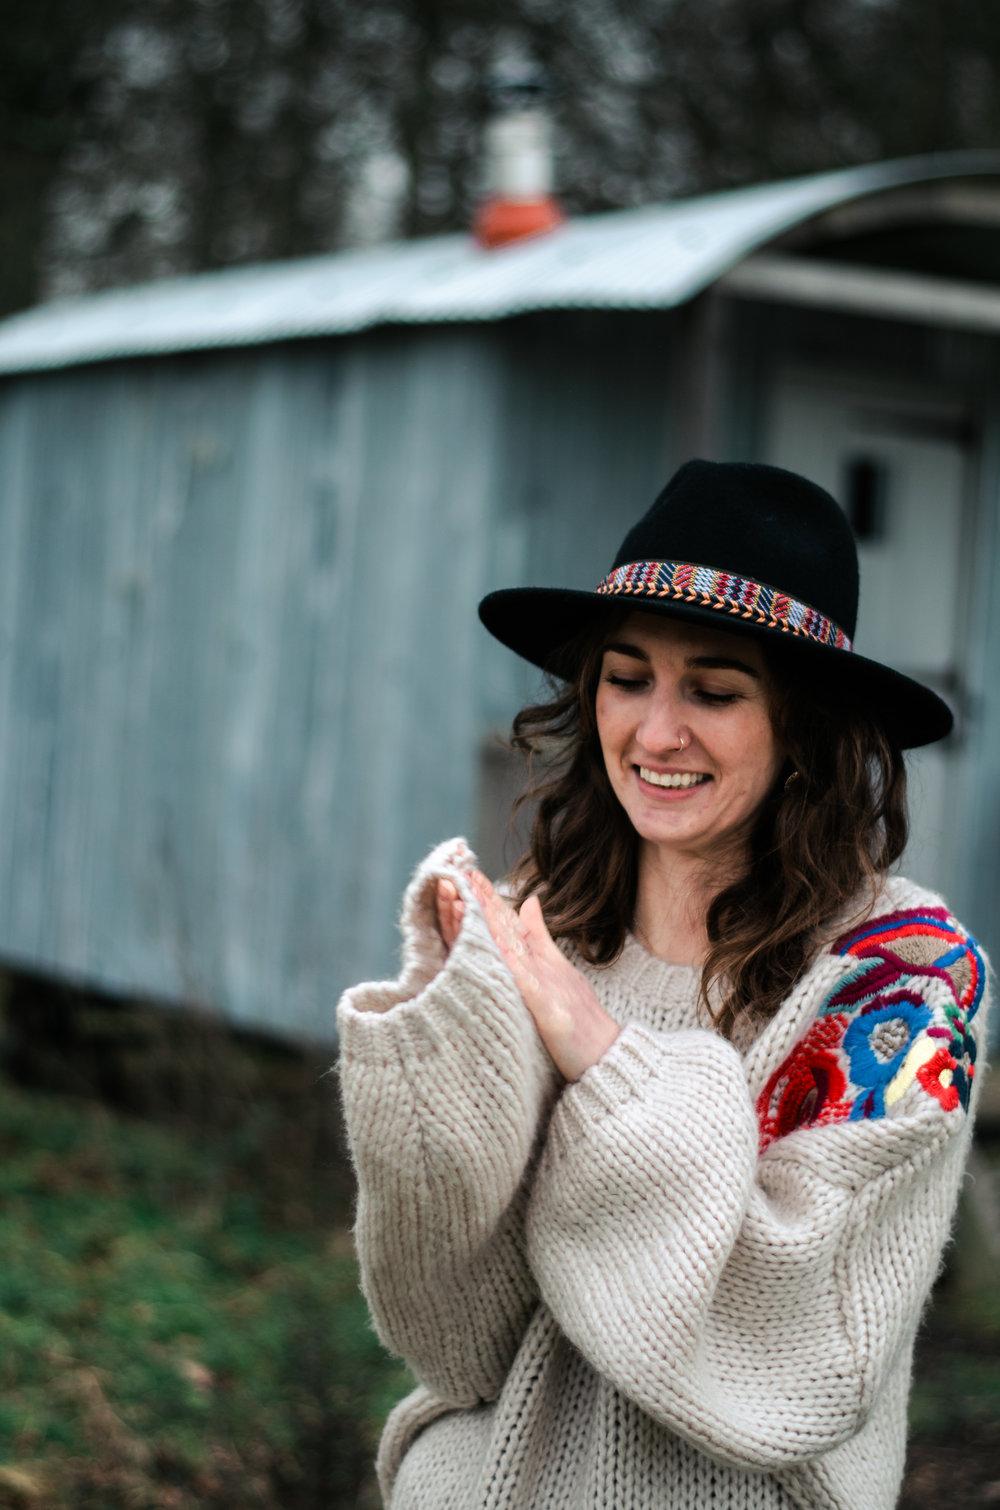 Chloe - Portraits - Aiste Saulyte Photography - 2018-01-05-83.jpg